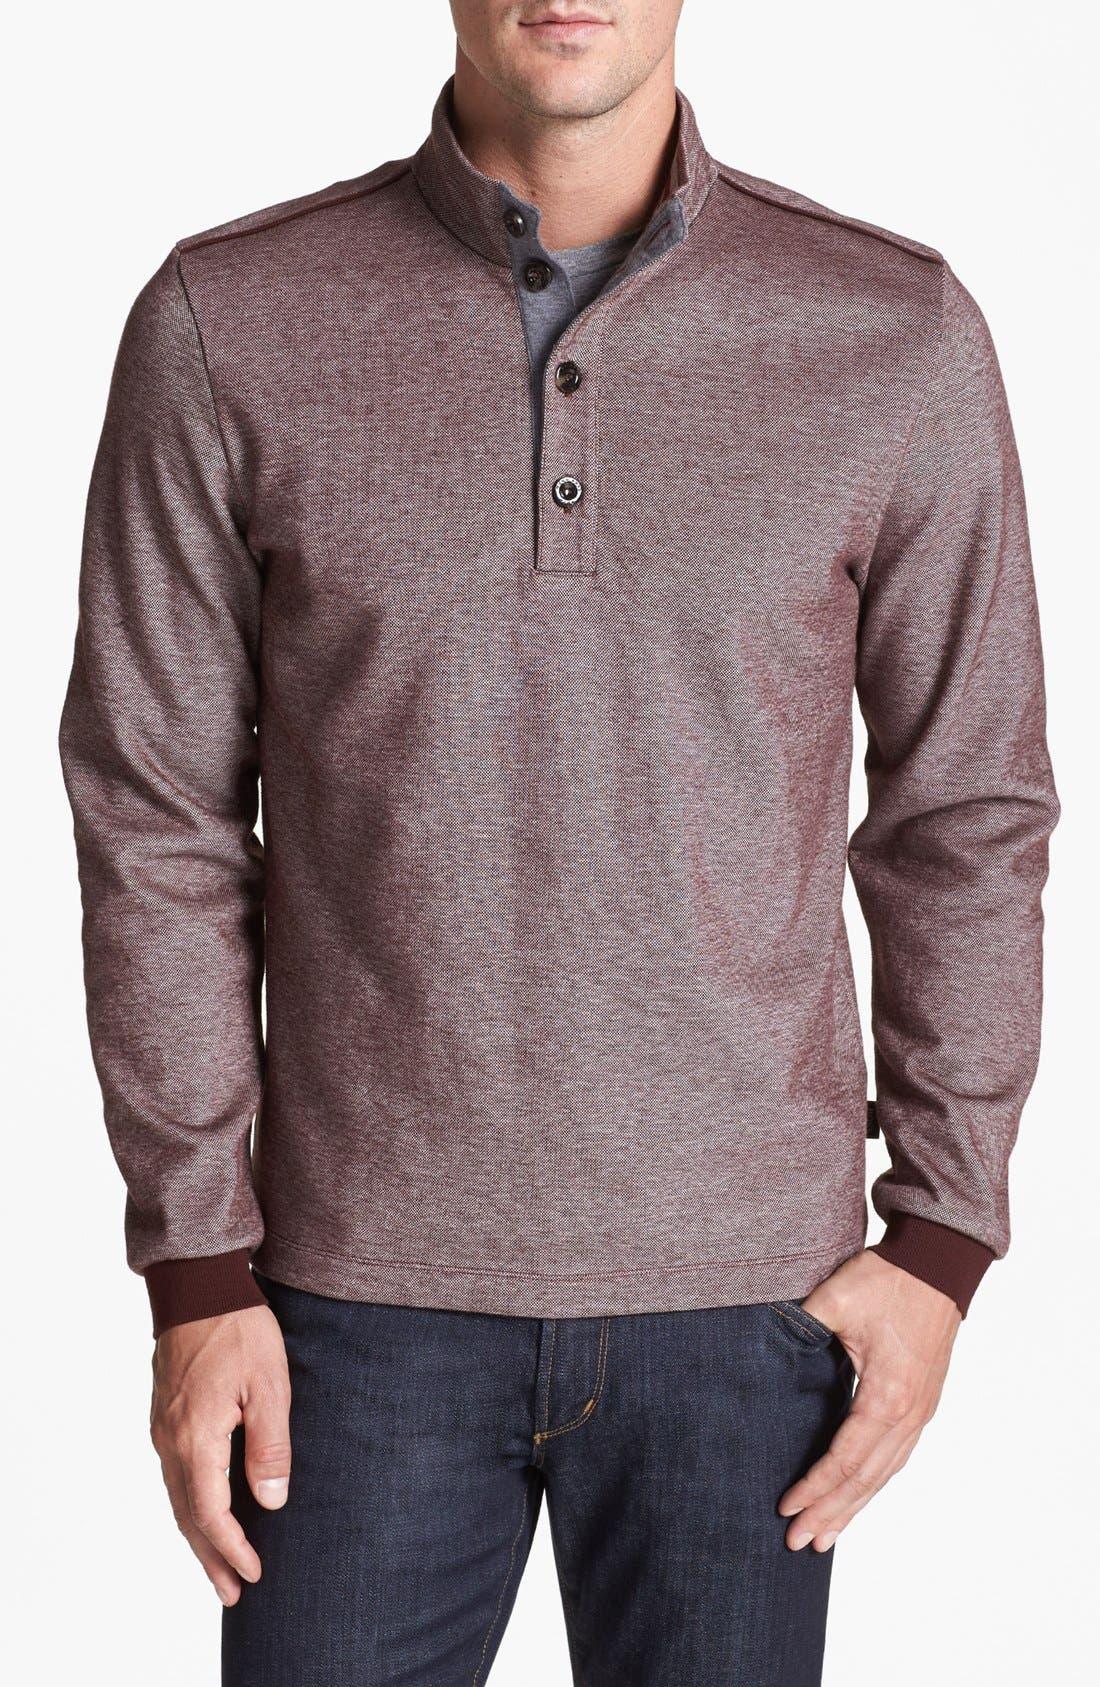 Main Image - BOSS HUGO BOSS 'Piceno' Mock Neck Sweatshirt